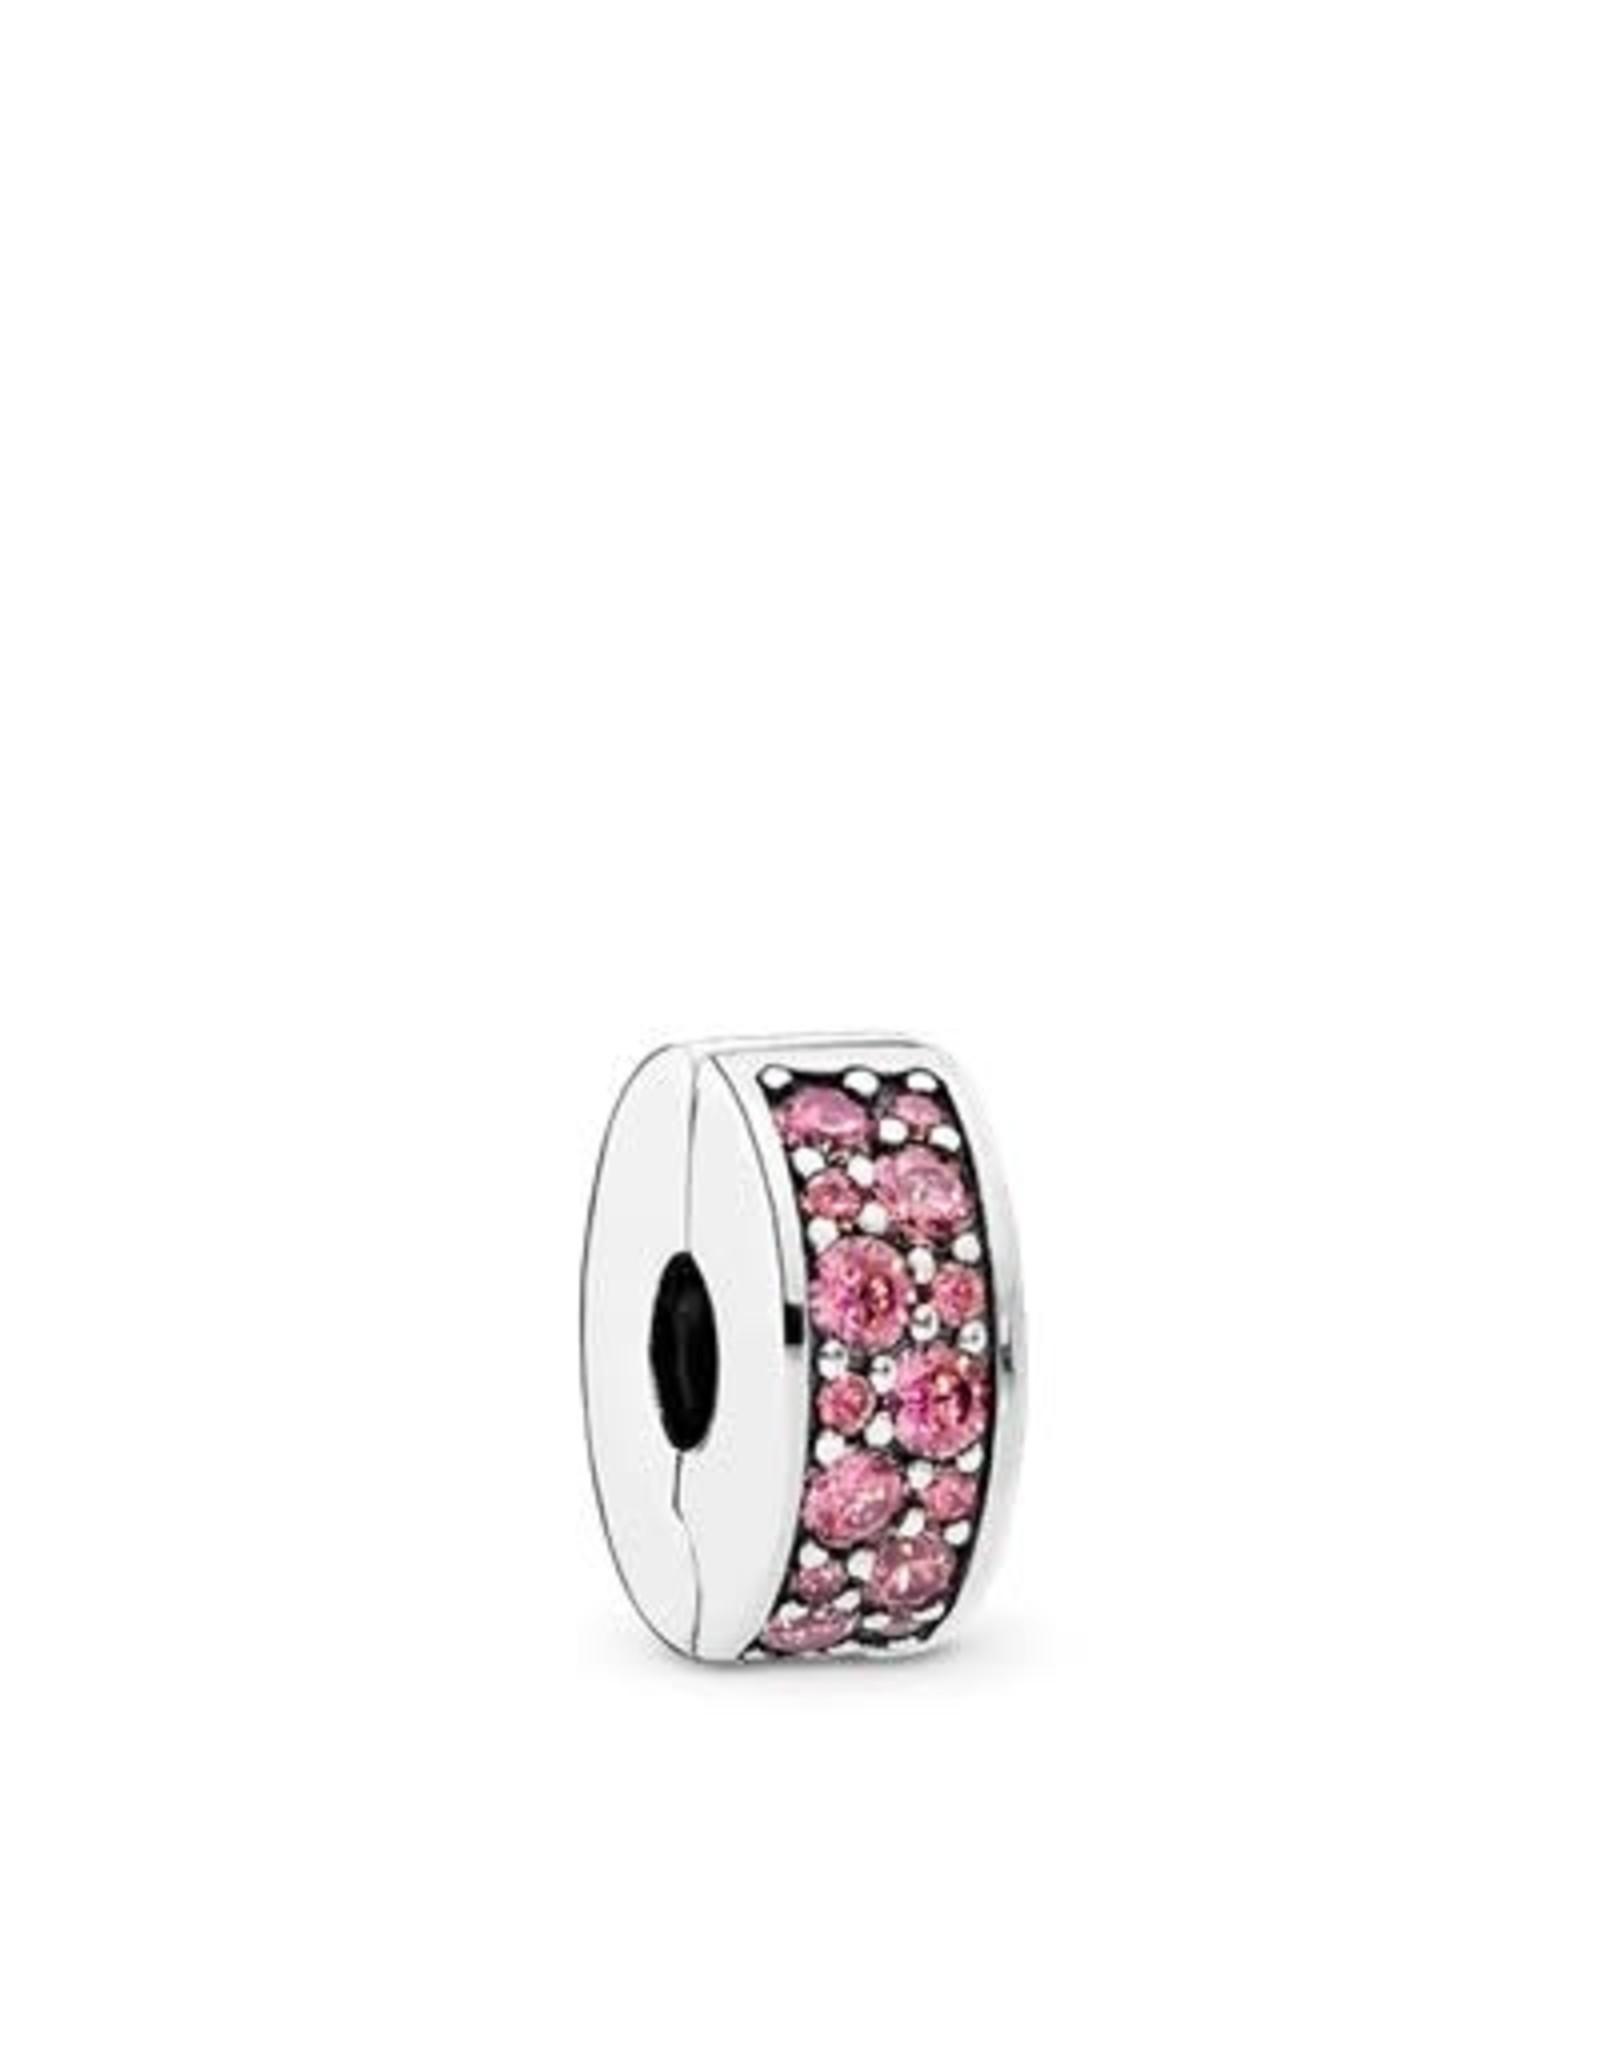 Pandora Pandora Clip Shining Elegance, Honeysuckle Pink,CZ